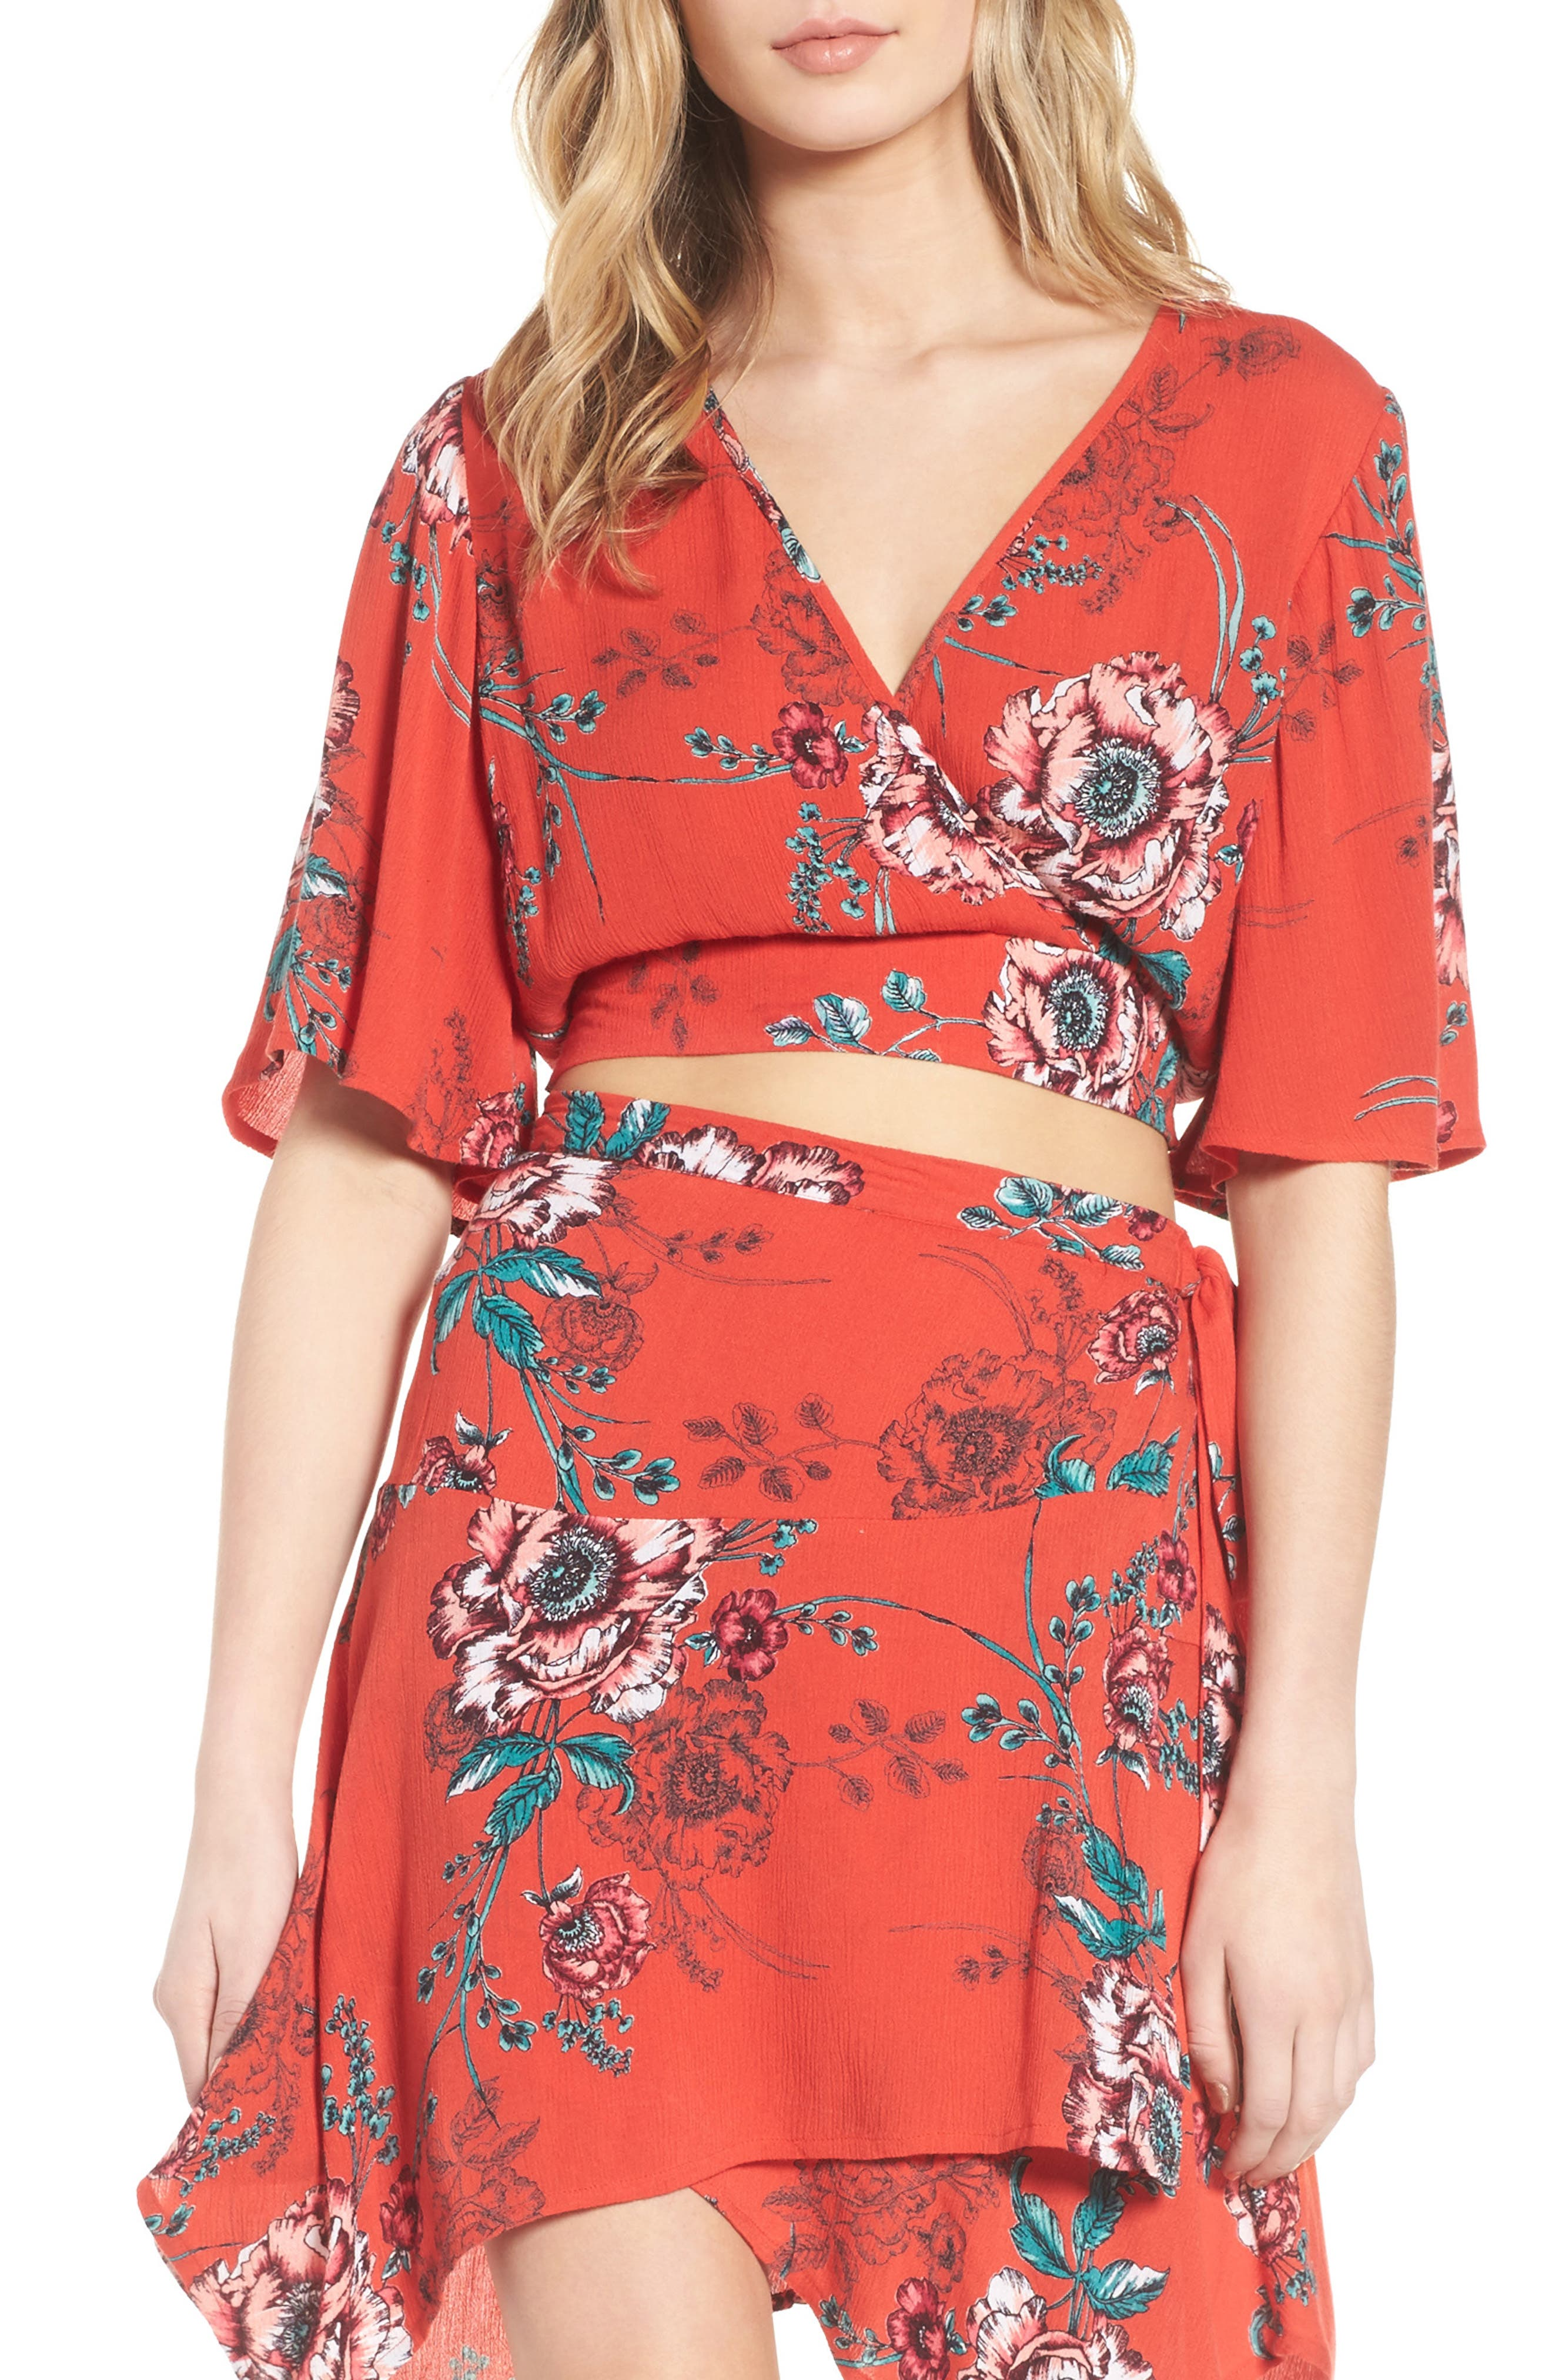 Shadow Floral Tie Back Crop Top,                         Main,                         color, Red/ Peach